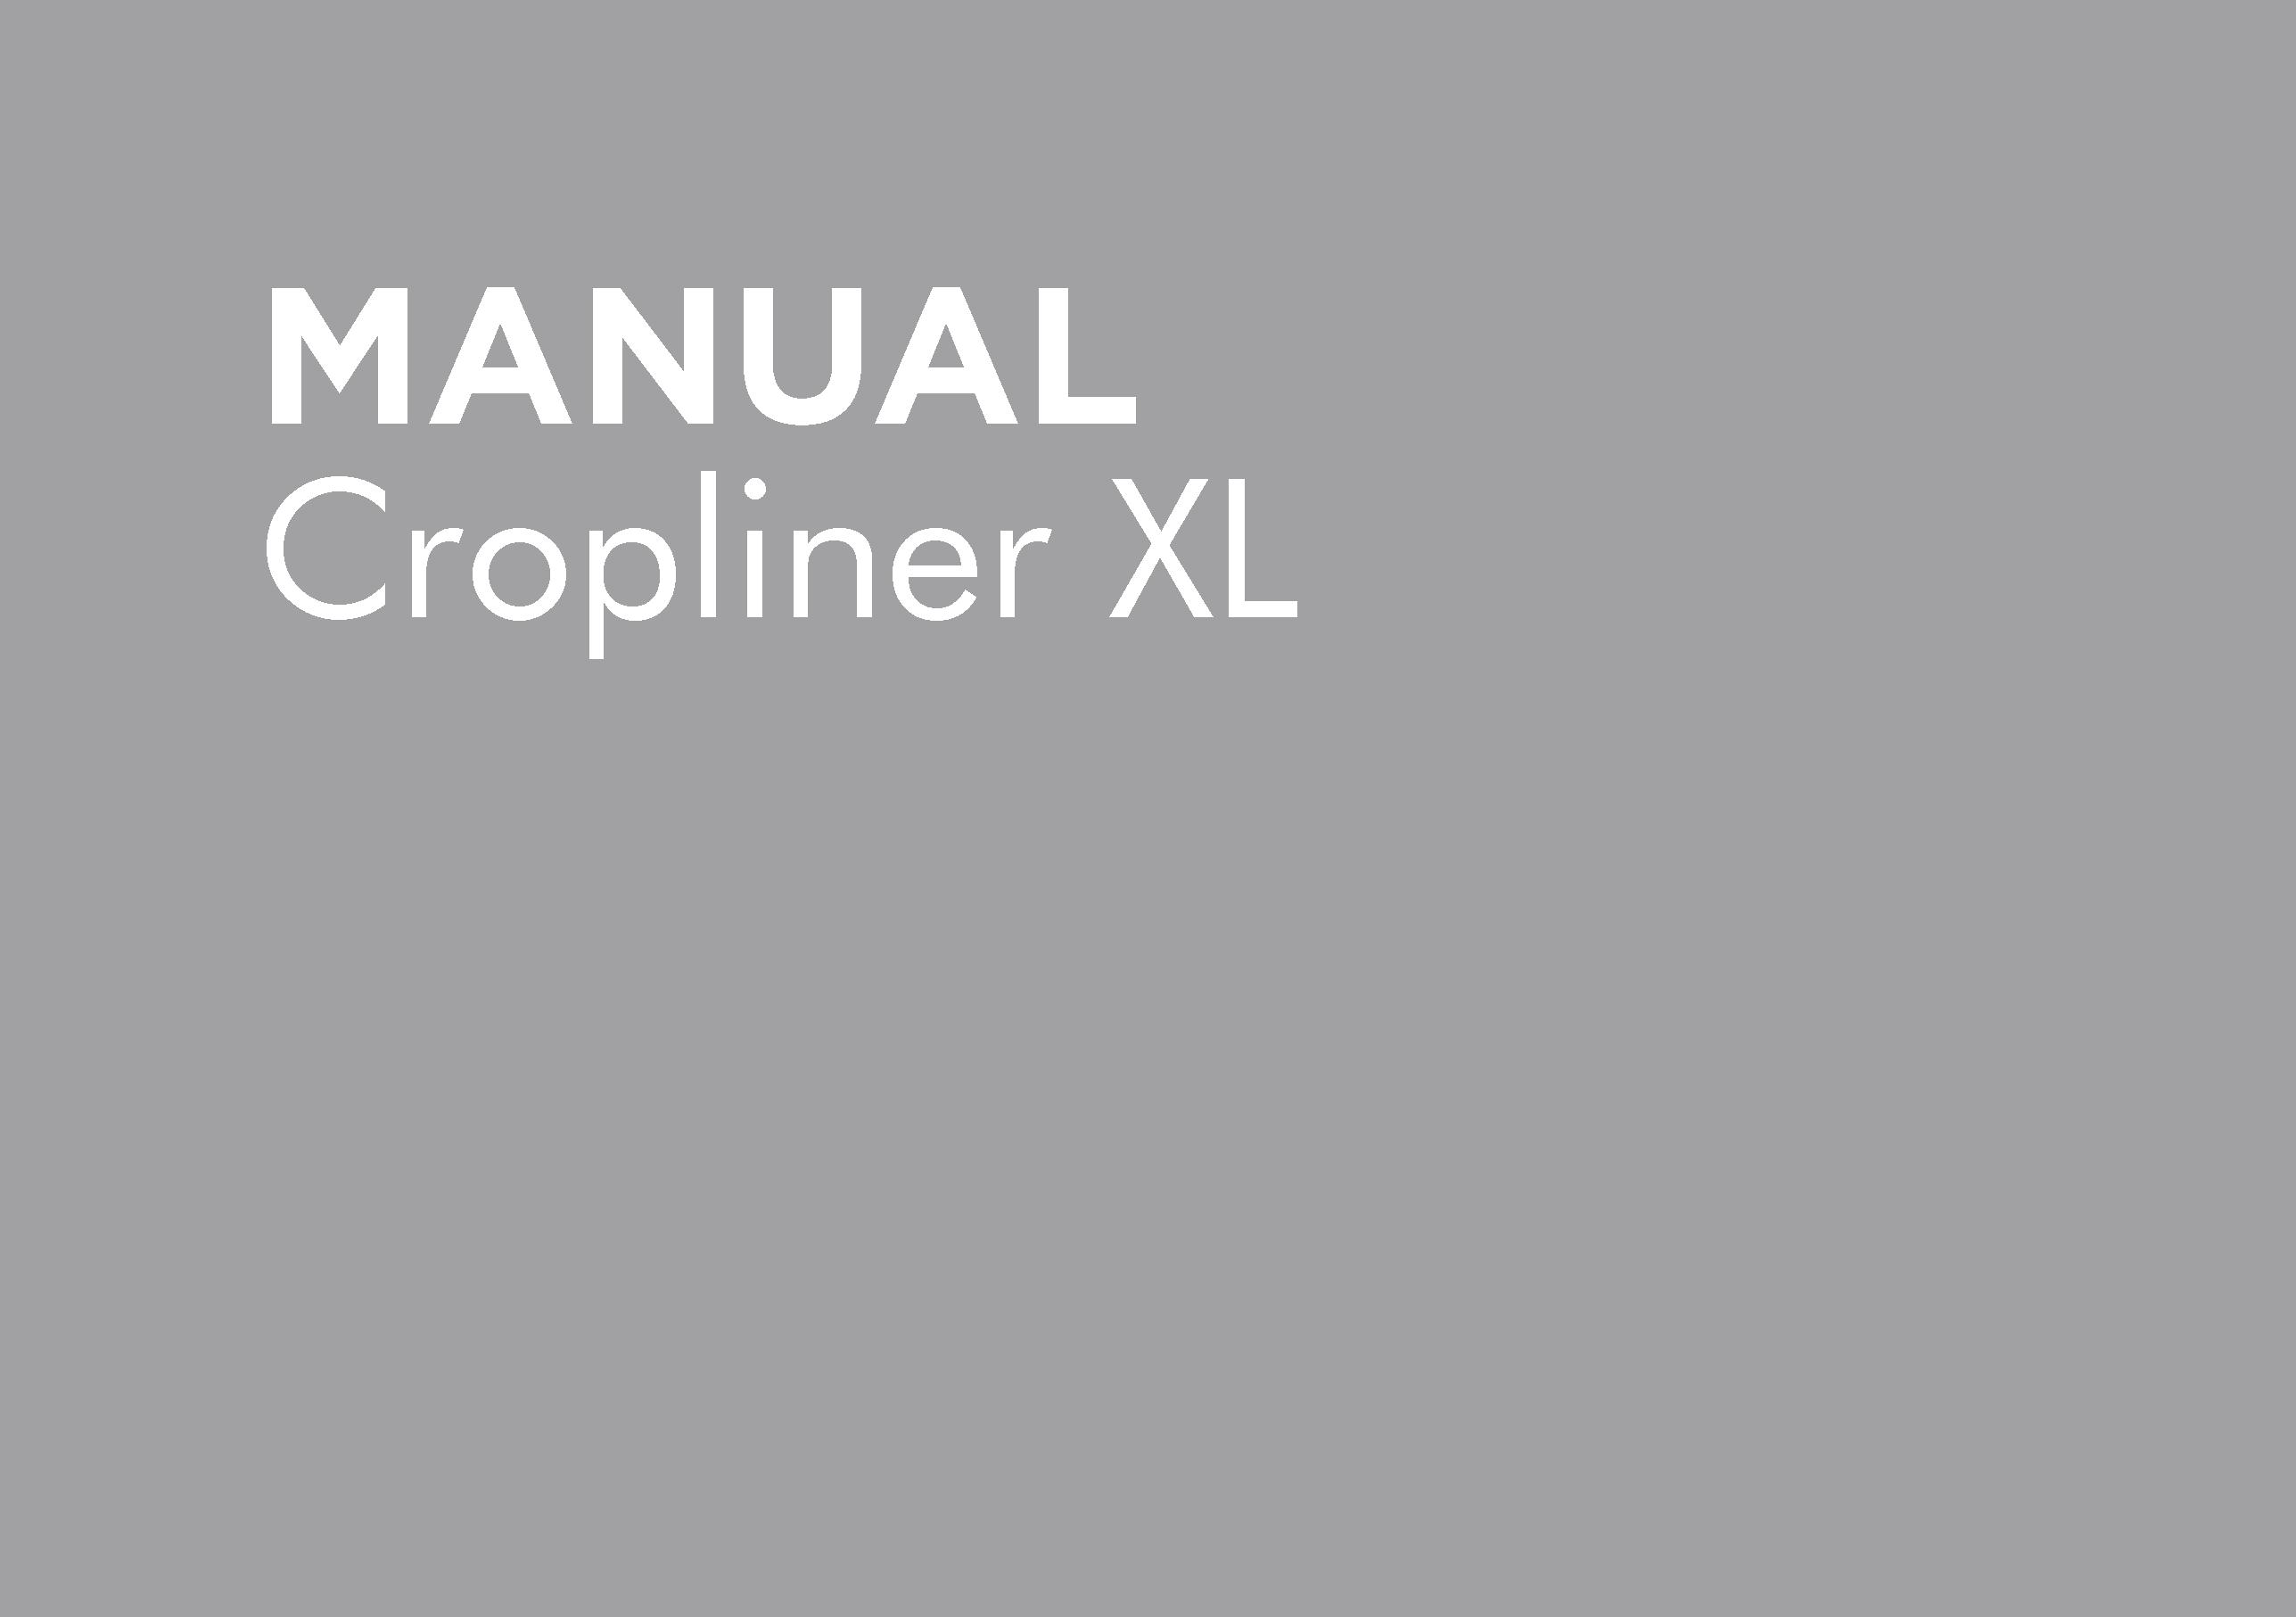 HT-POM000009 – CROPLINER XL